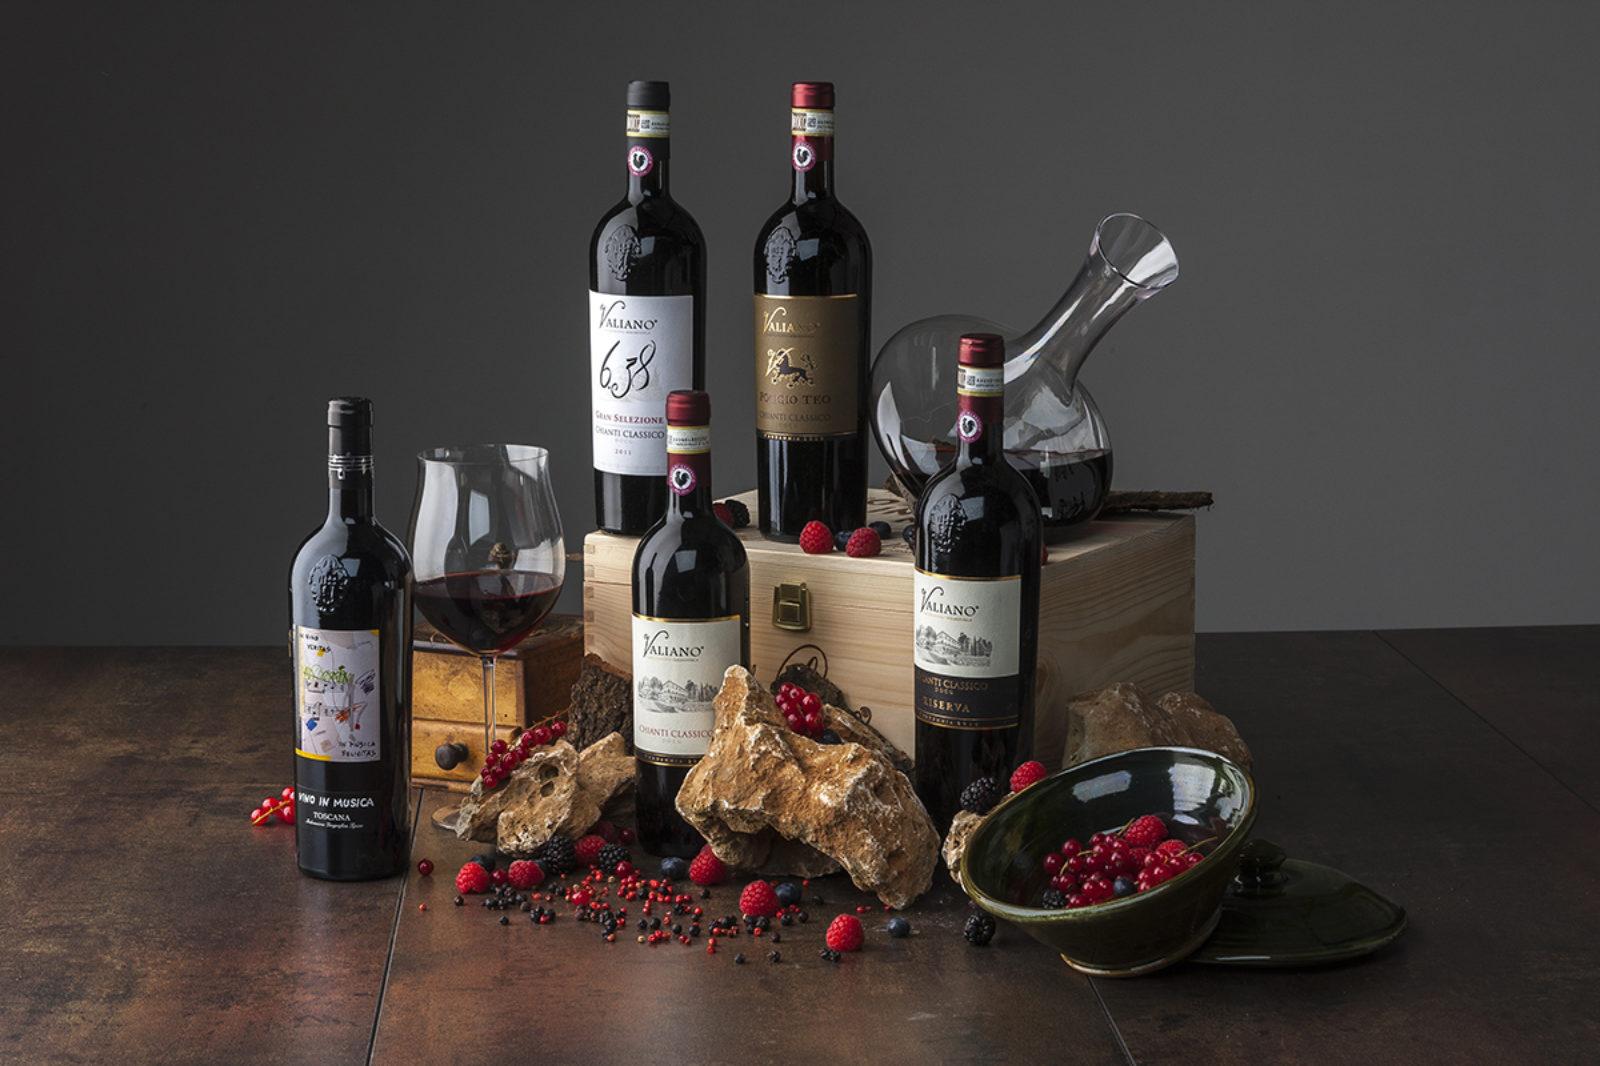 Vini Valiano